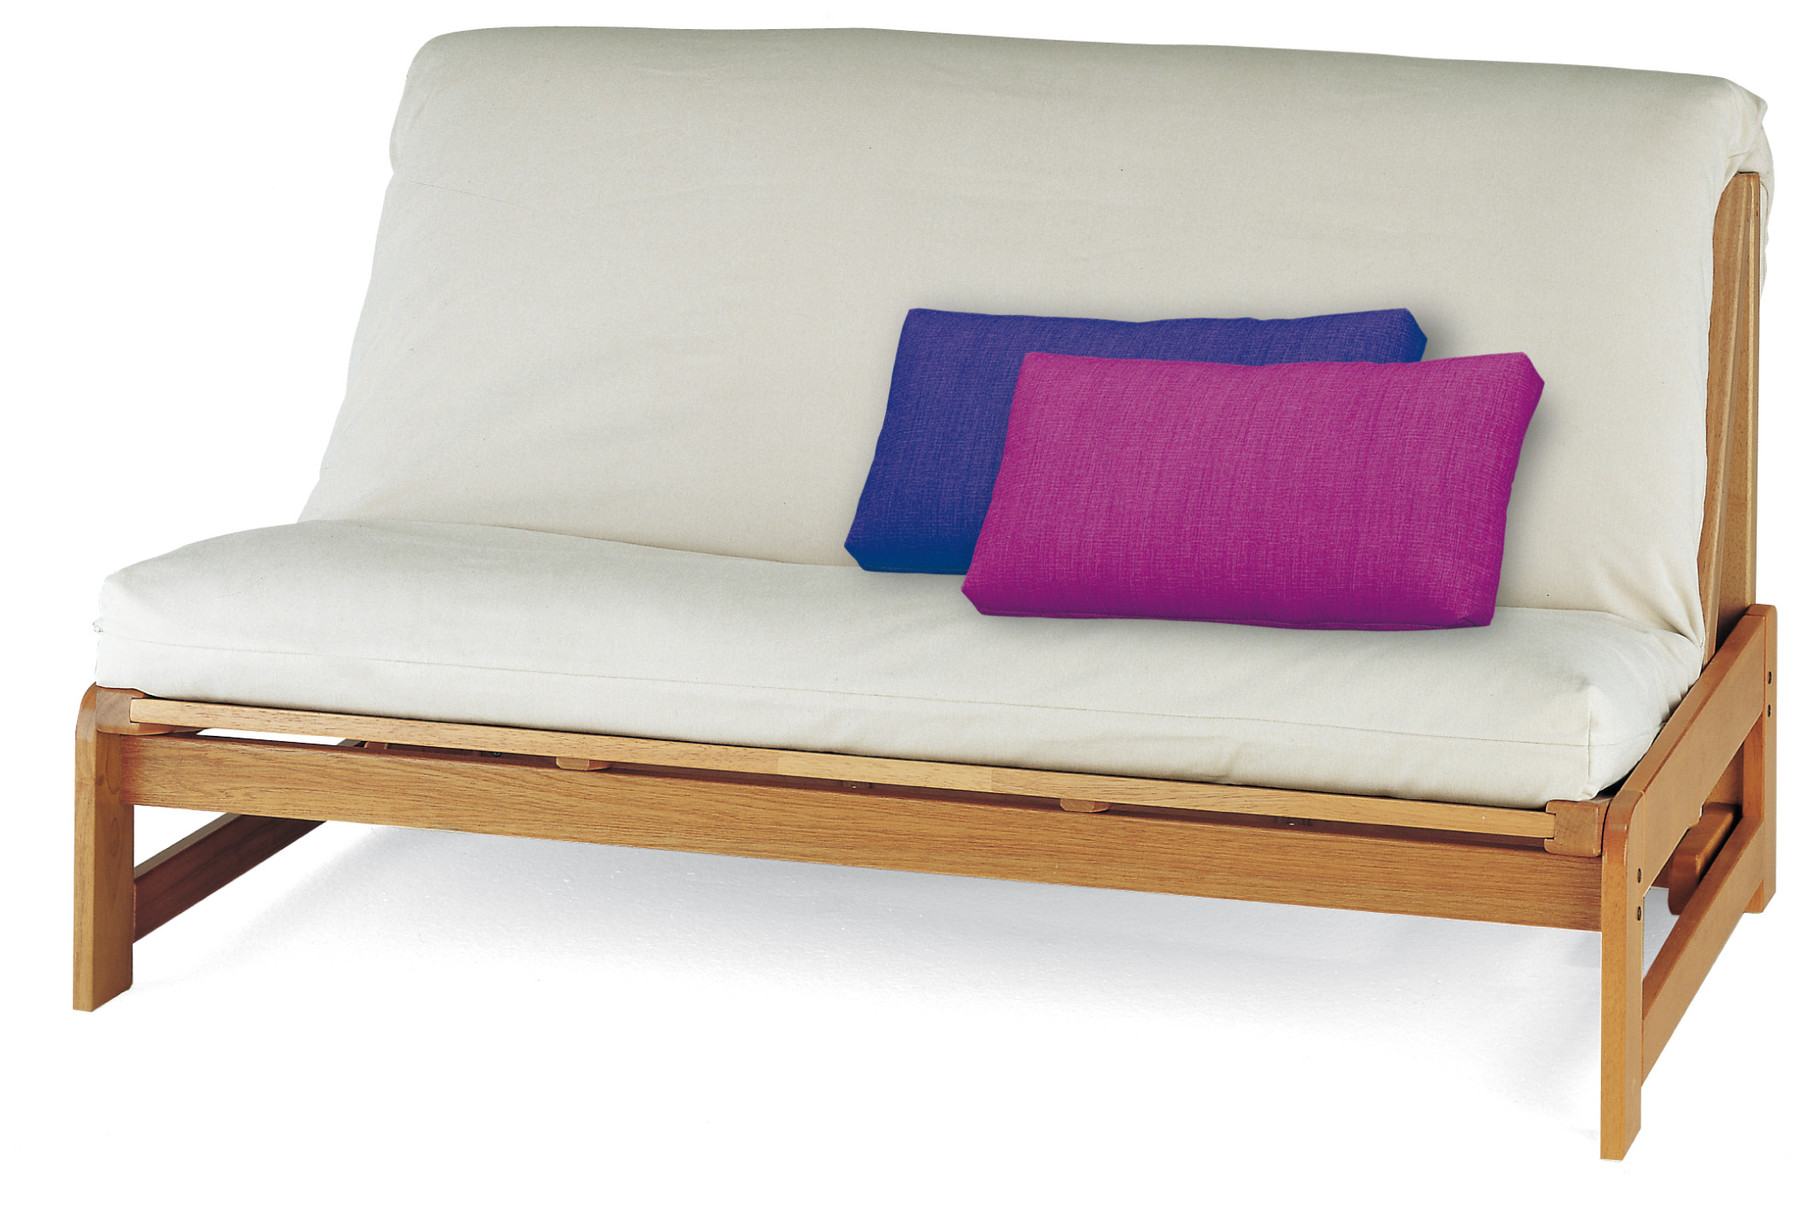 Sof s cama futon line - Sofa cama madrid ...